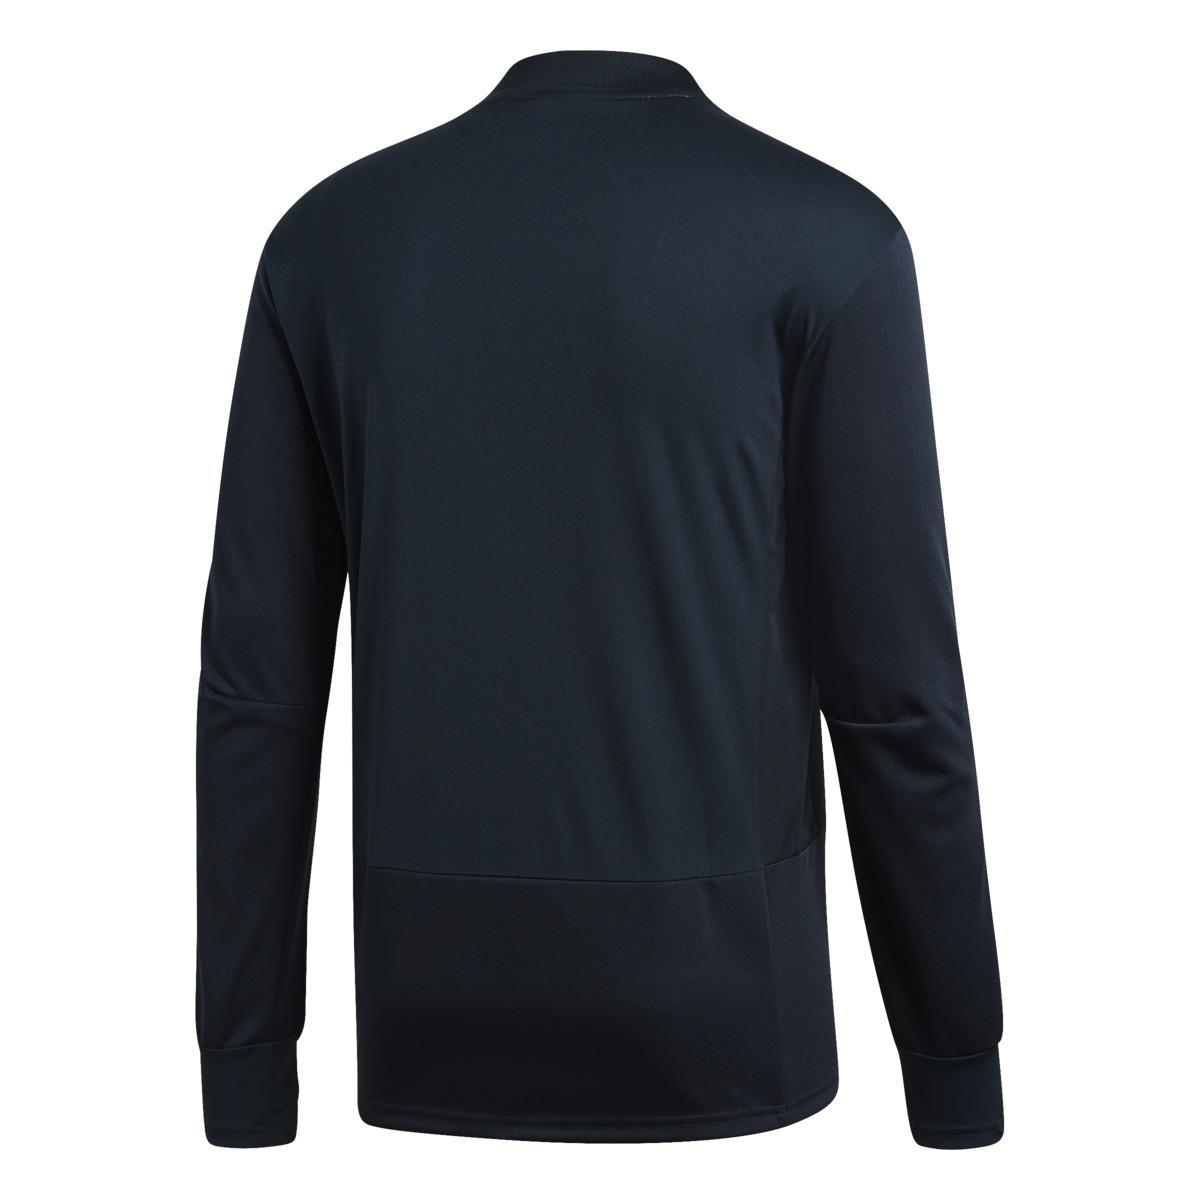 bbadc610f13 Adidas - Gray Real Madrid Cf 2018-2019 Training Shirt for Men - Lyst. View  fullscreen